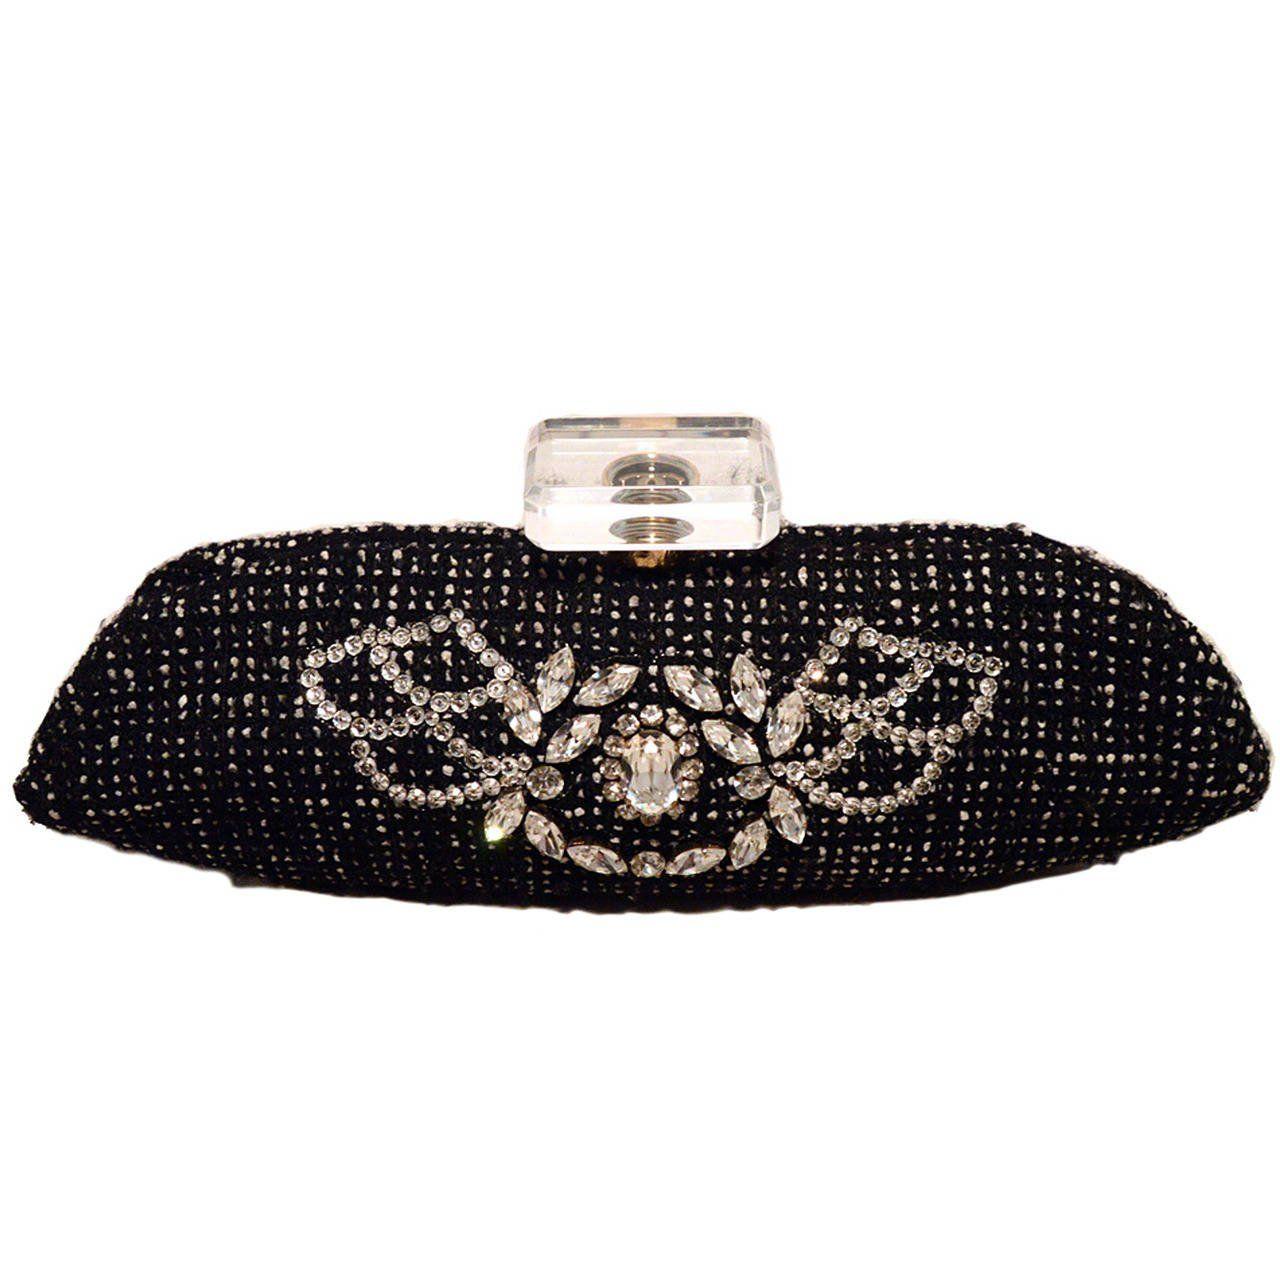 1stdibs 1950s Josef Black Caviar Beaded Rhinestone Jewel Frame Evening Bag Handbag dHprg